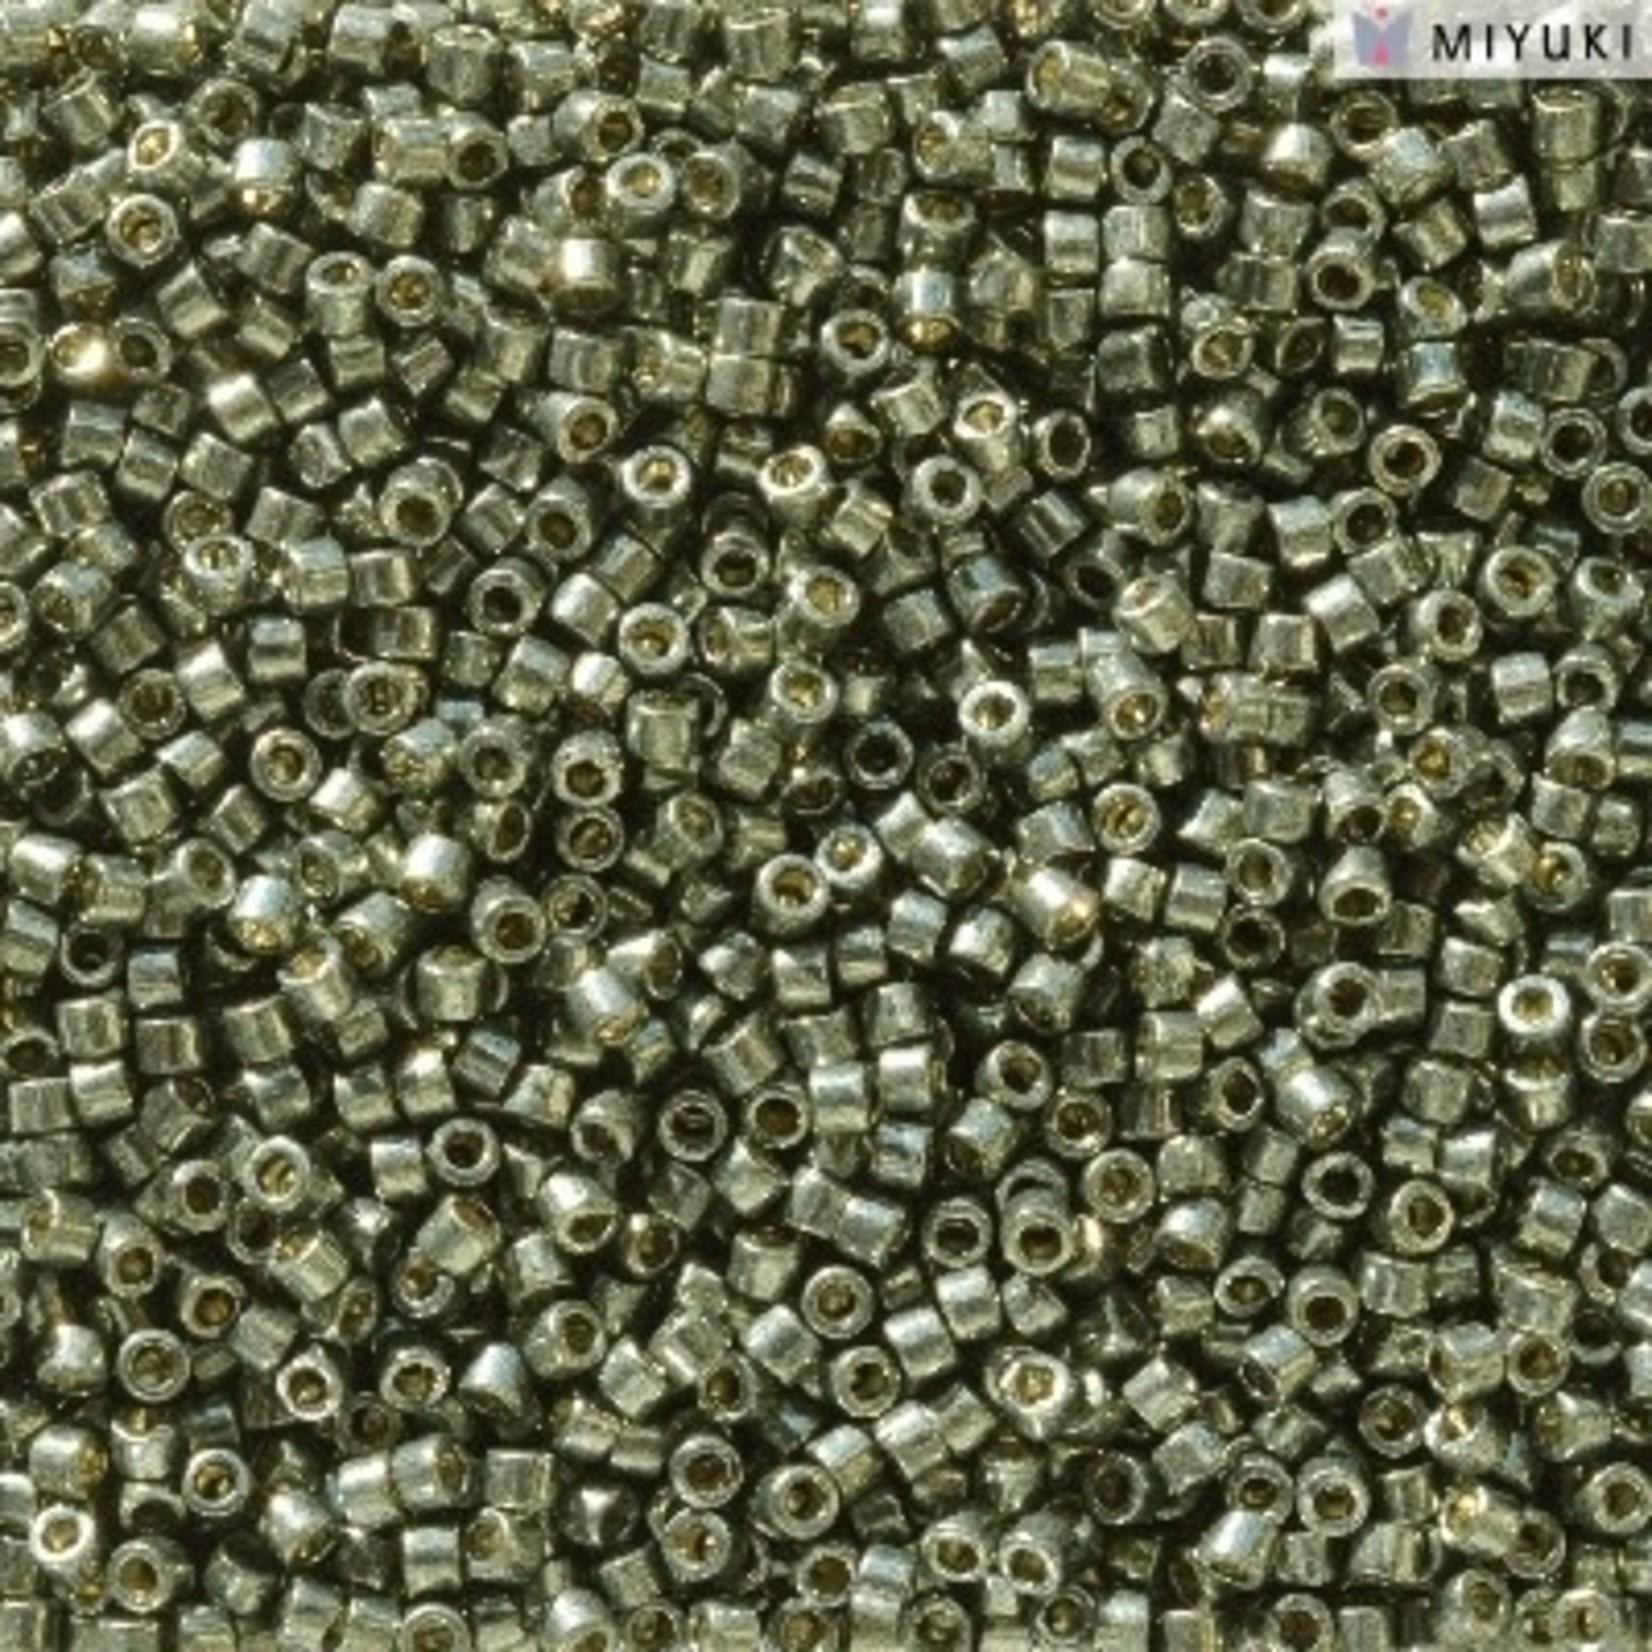 Miyuki 7.2 GM DB2512 11/0 Delica: Dk Steel Green DC GA (APX 1400 PCS)